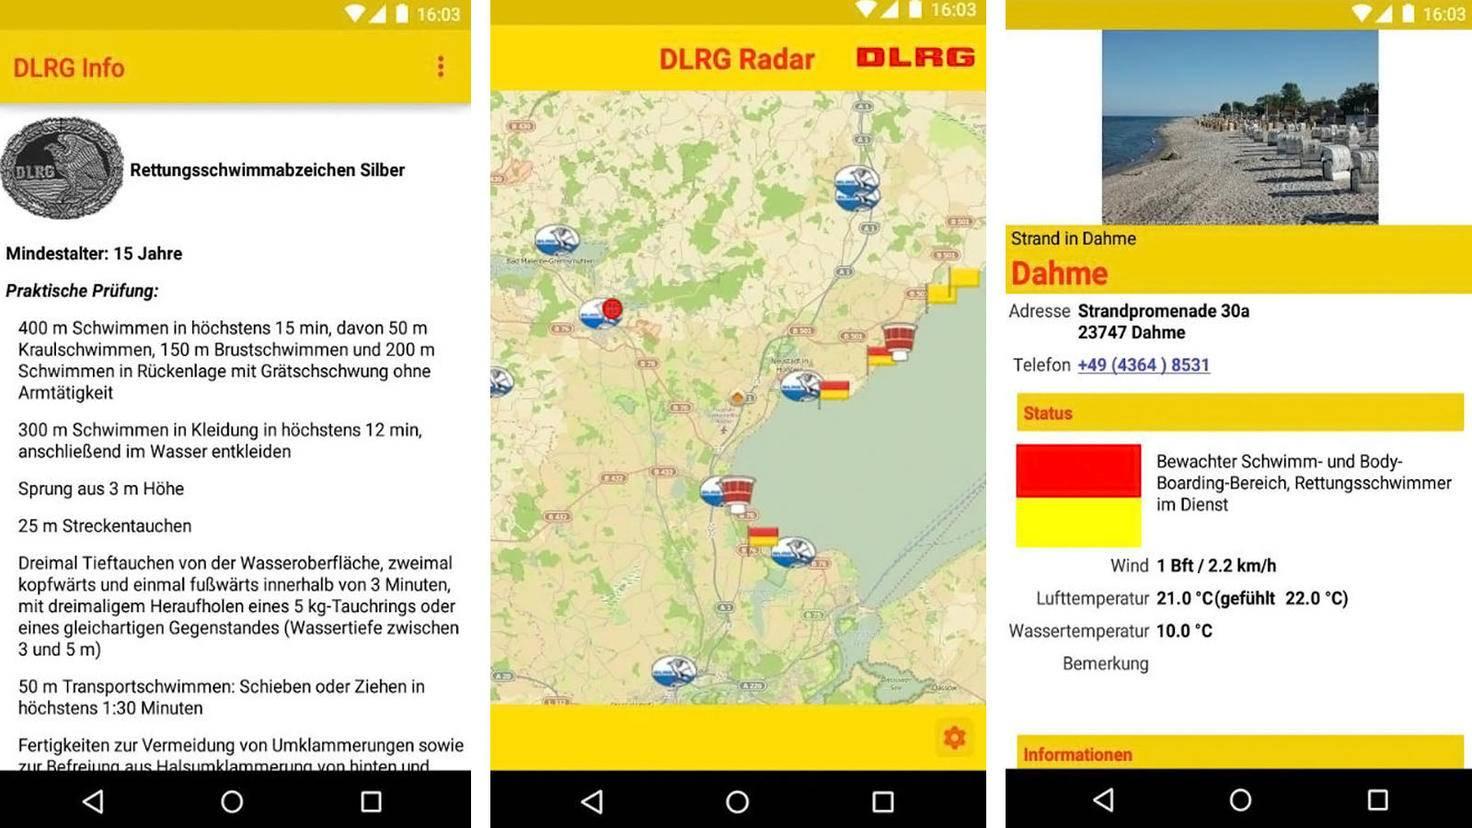 DLRG Info App-Google Play Store-DLRG Arbeitskreis Internet